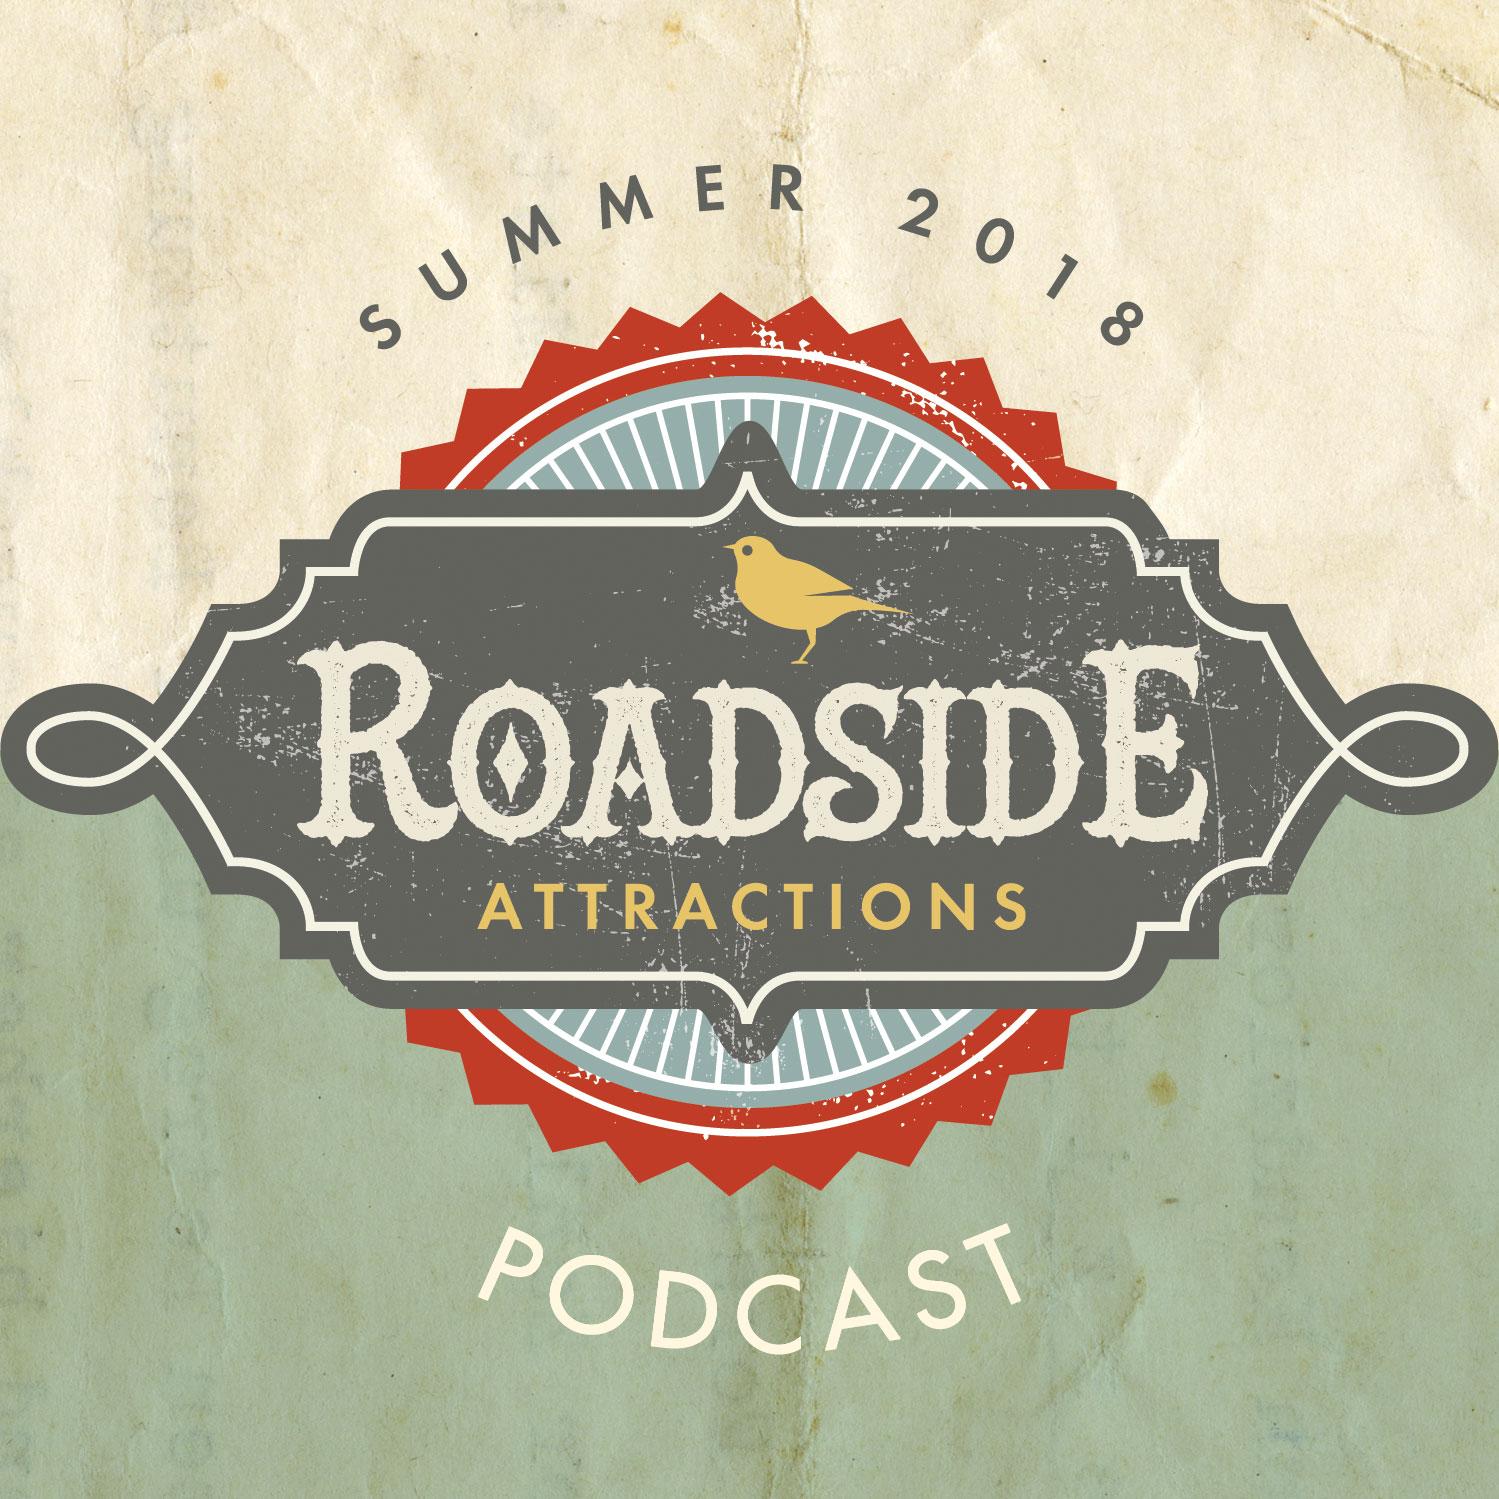 RA-podcast-square.jpg